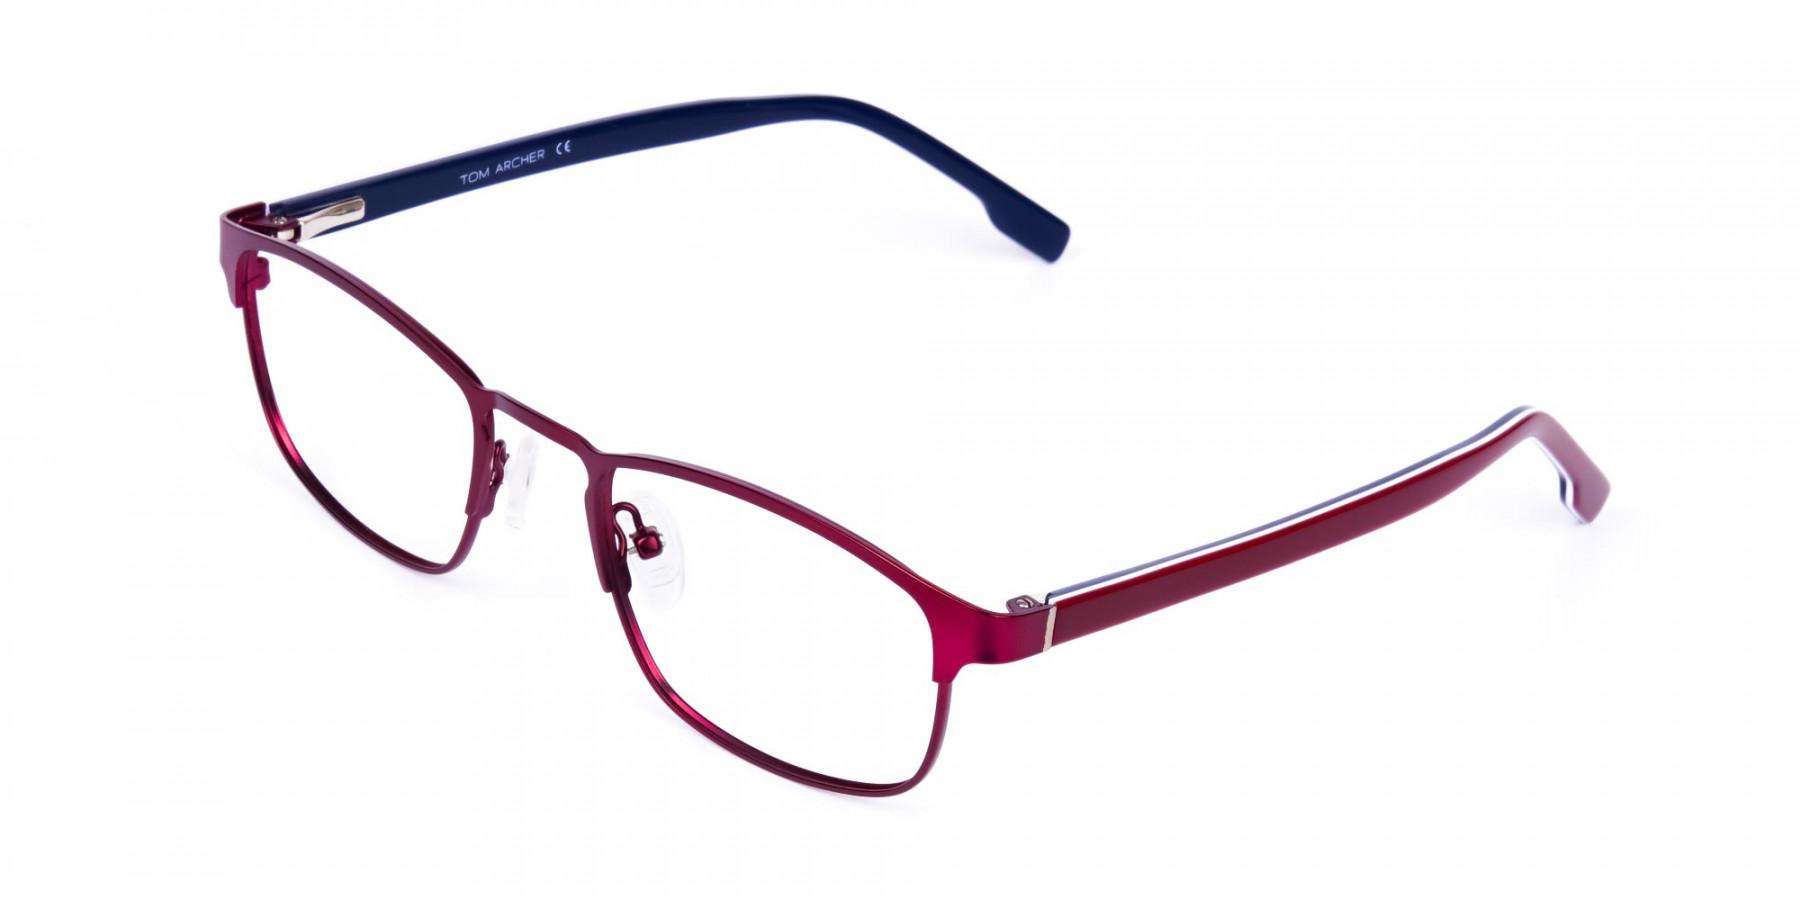 Metallic-Red-Rectangle-Glasses-Frames-1